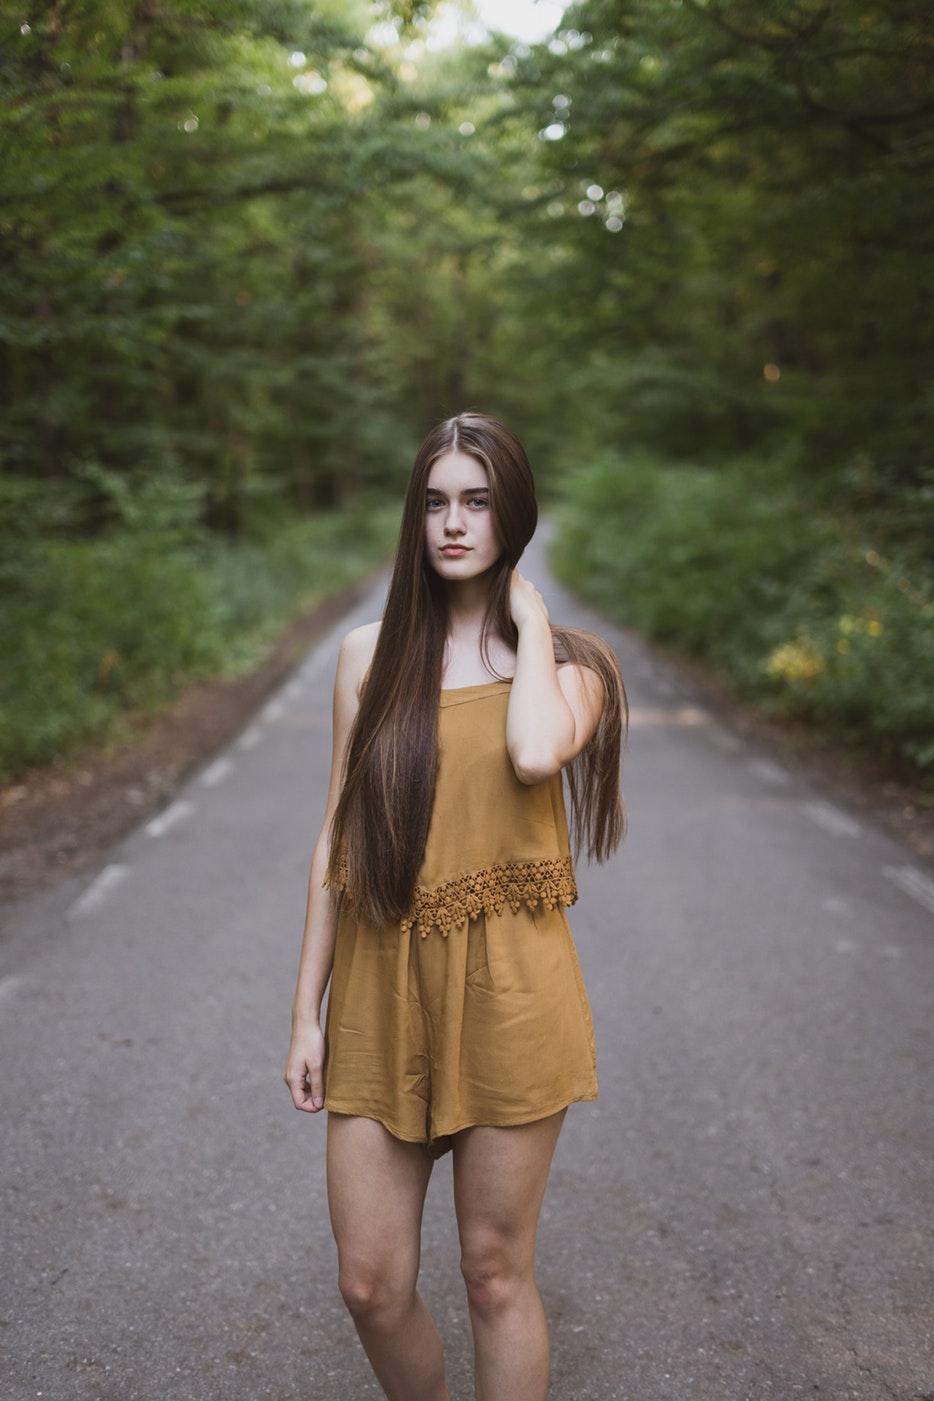 Portrætfotografi - Modefotografi - Reportagefotografi - Virksomhedsfotografi